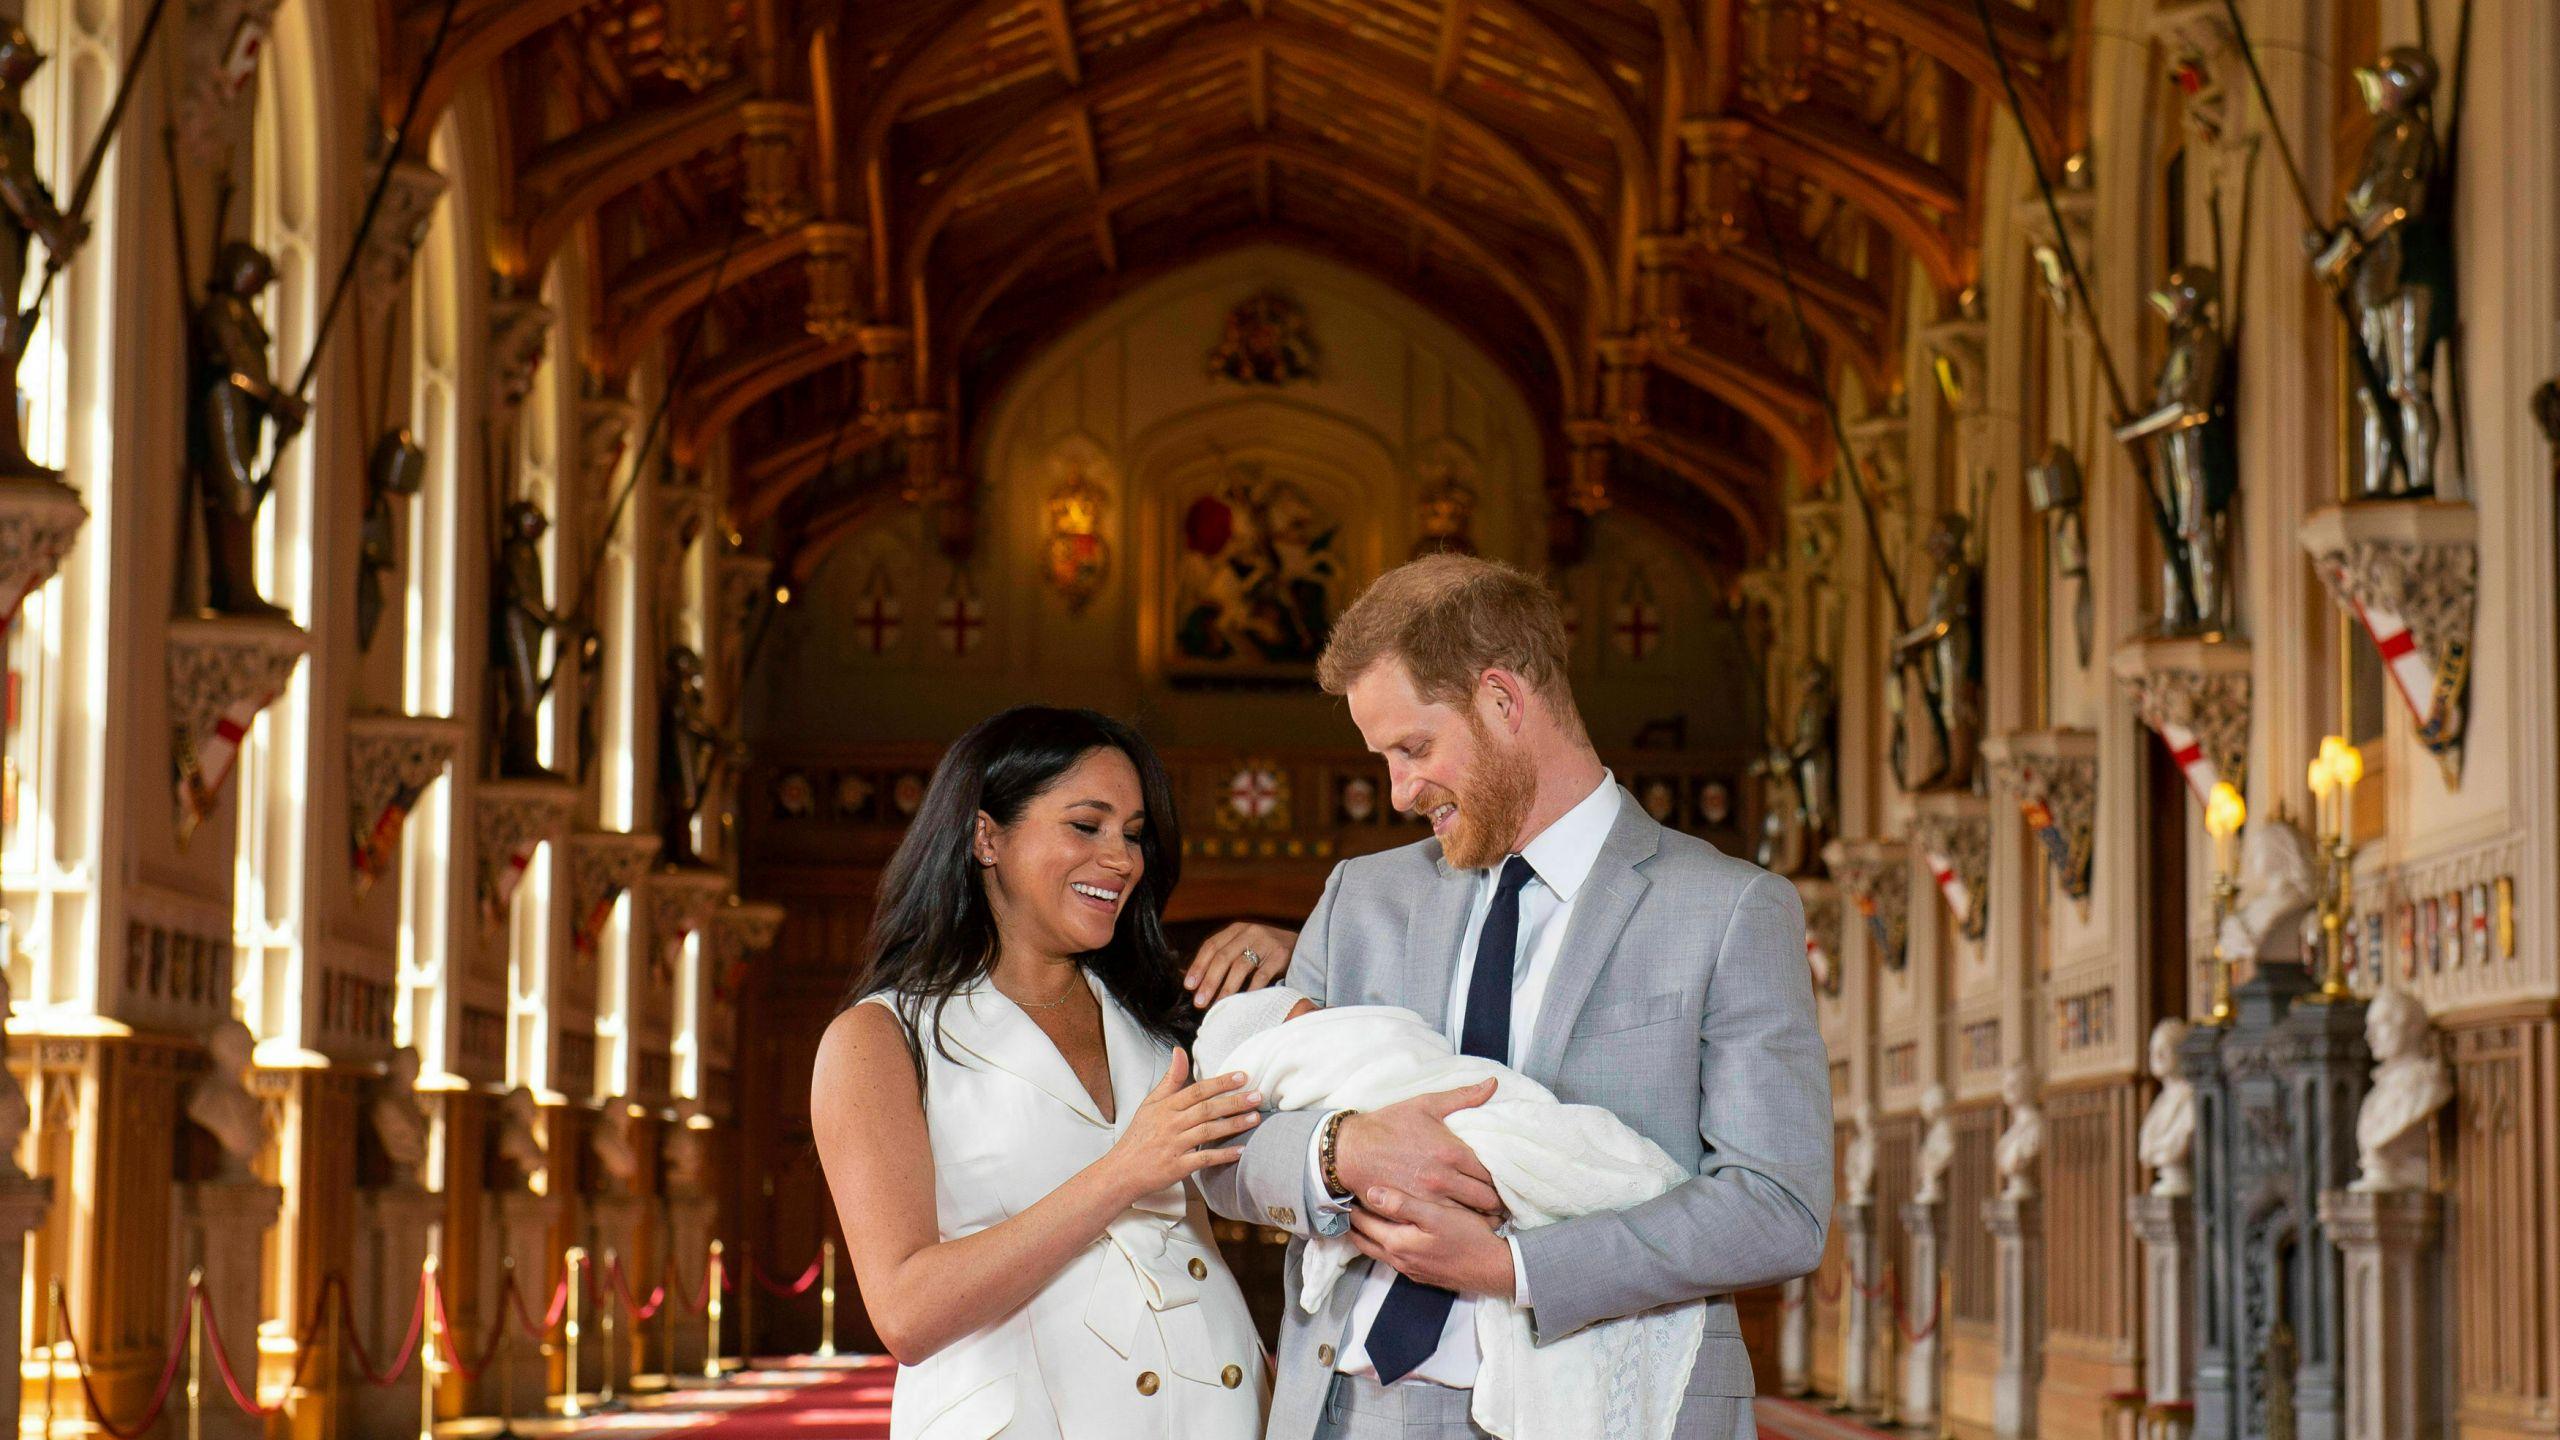 APTOPIX_Britain_Royal_Baby_07961-159532.jpg18258414